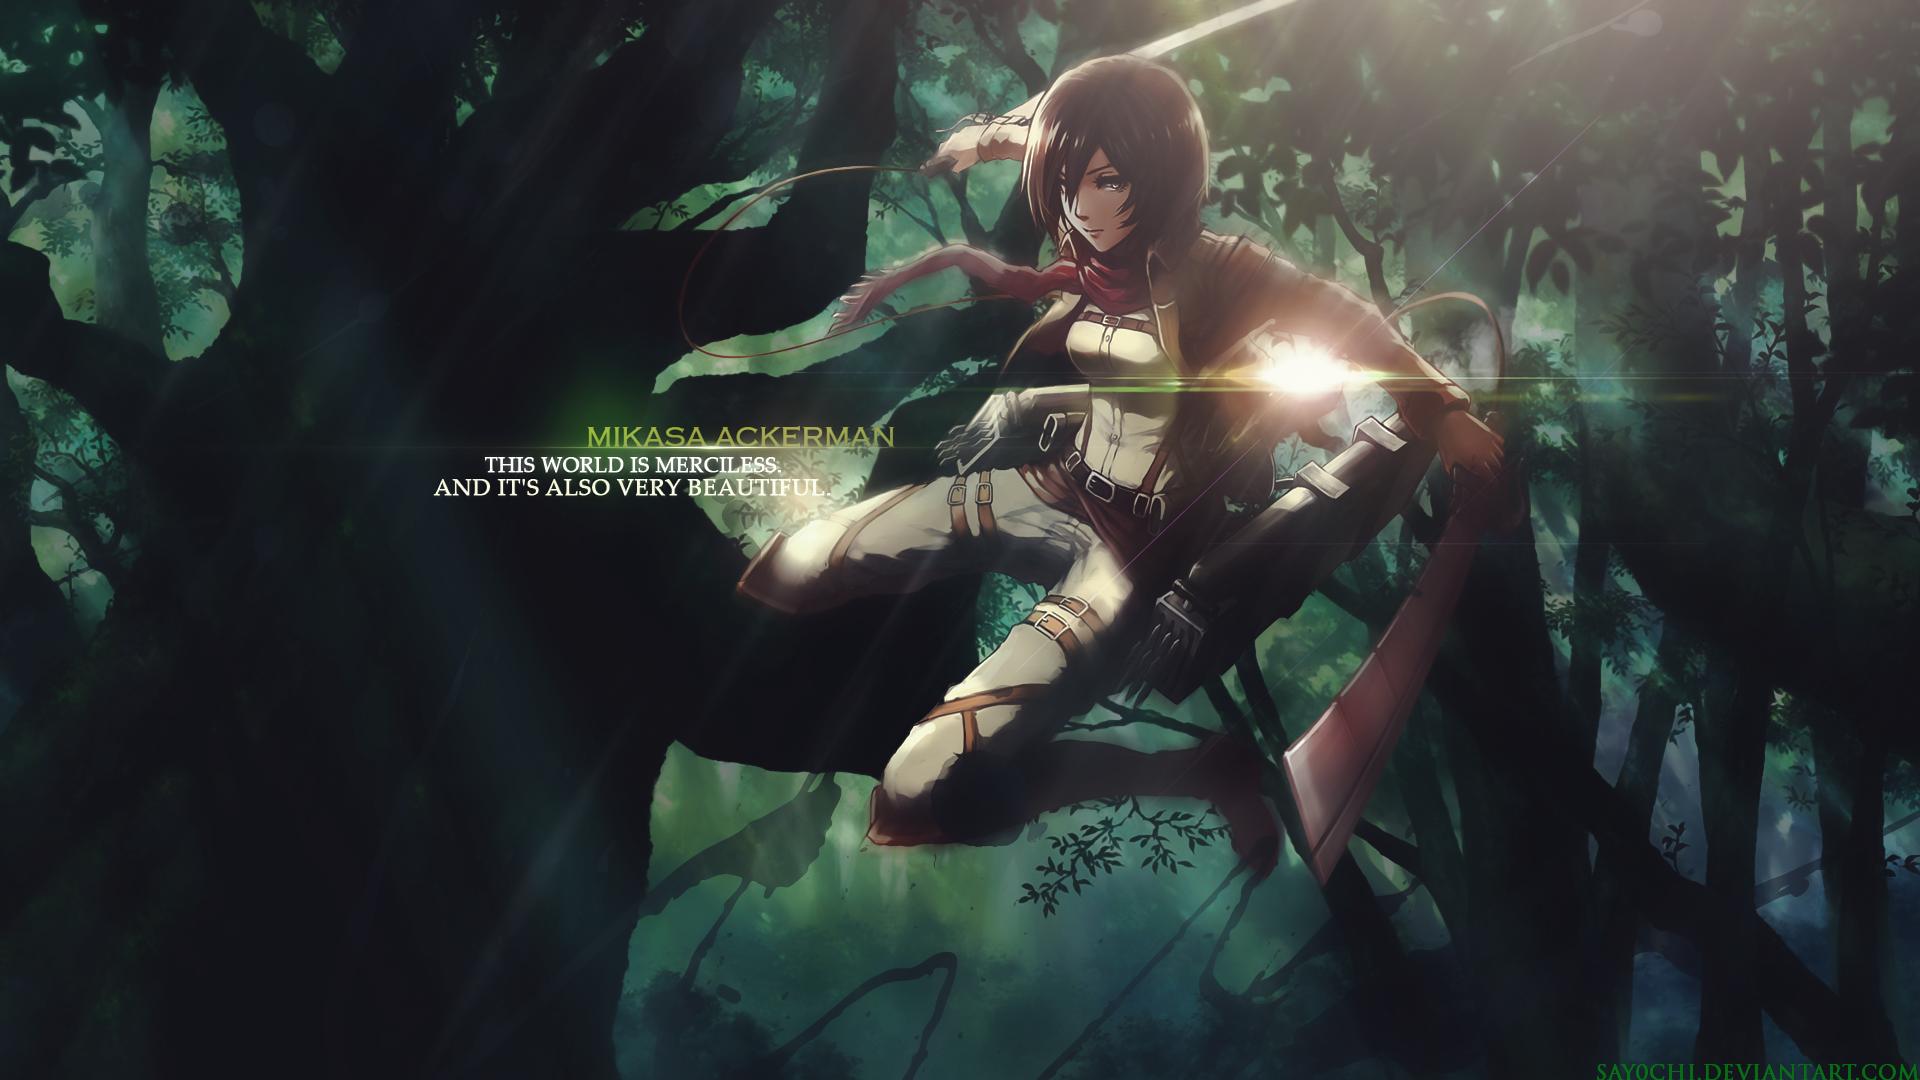 Mikasa Ackerman Wallpaper 1920x1080 Hd By Say0chi On Deviantart Attack On Titan Season Attack On Titan Attack On Titan Season 2